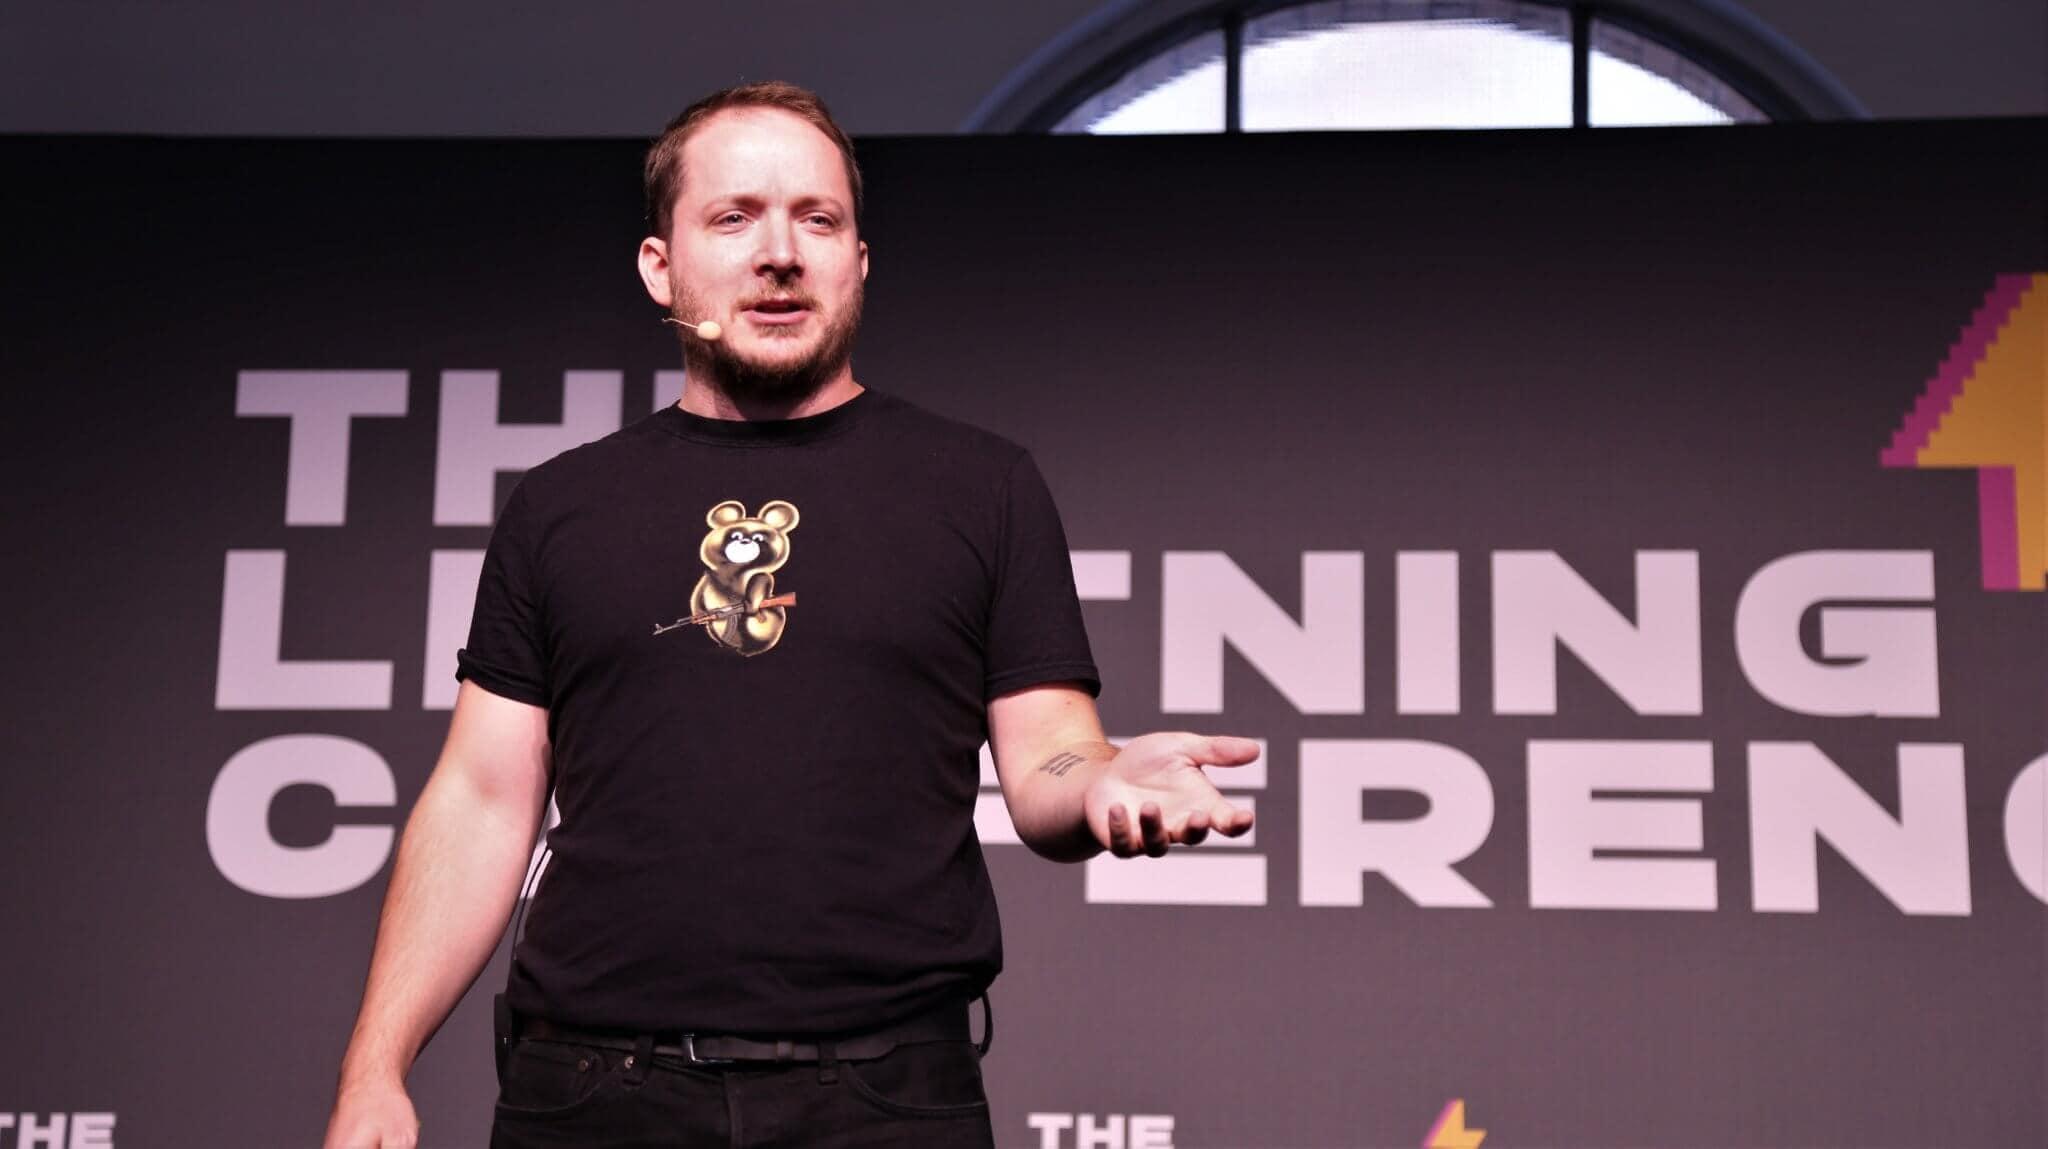 Giacomo Zucco referierte auf der Lightning-Conference über das RGB-Protokoll.